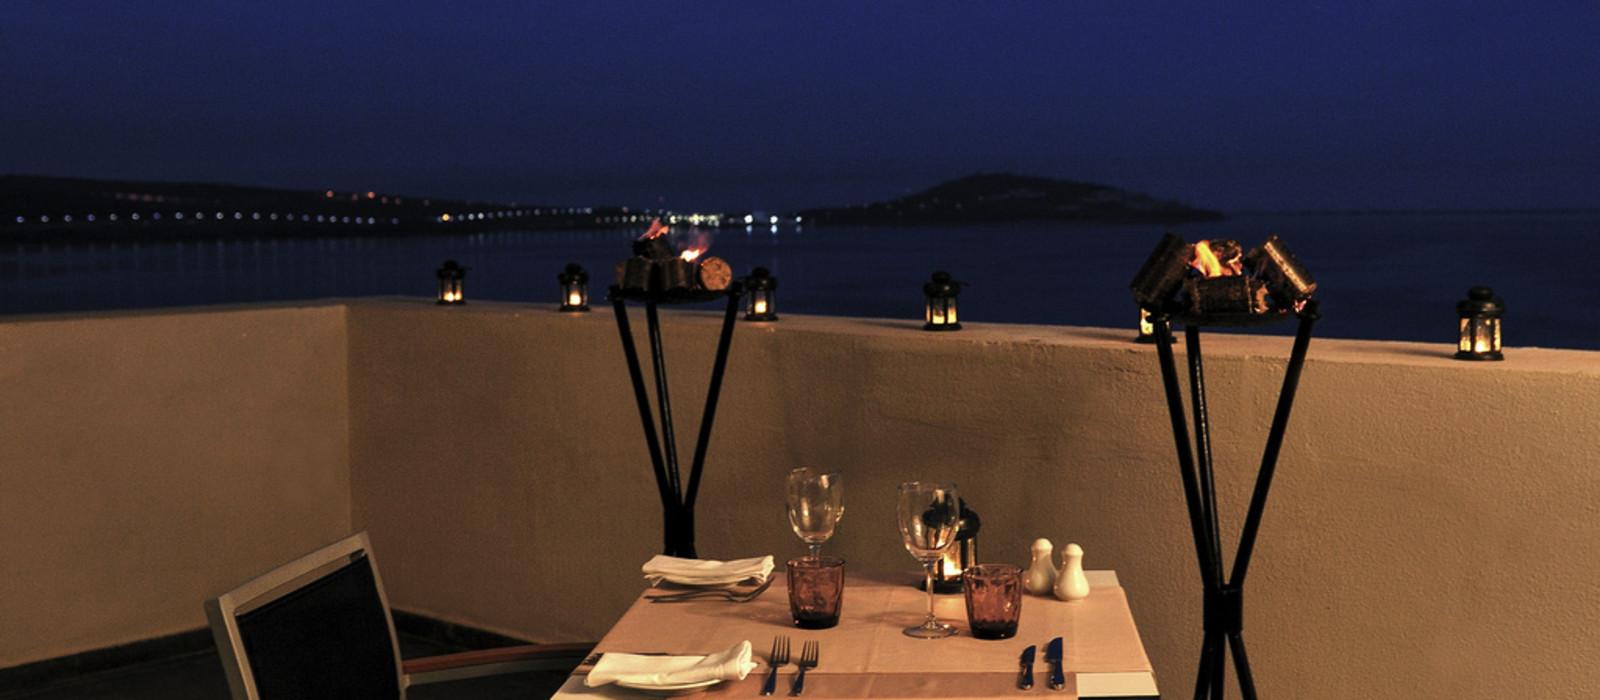 Hotel Mercure Nador Rif Morocco